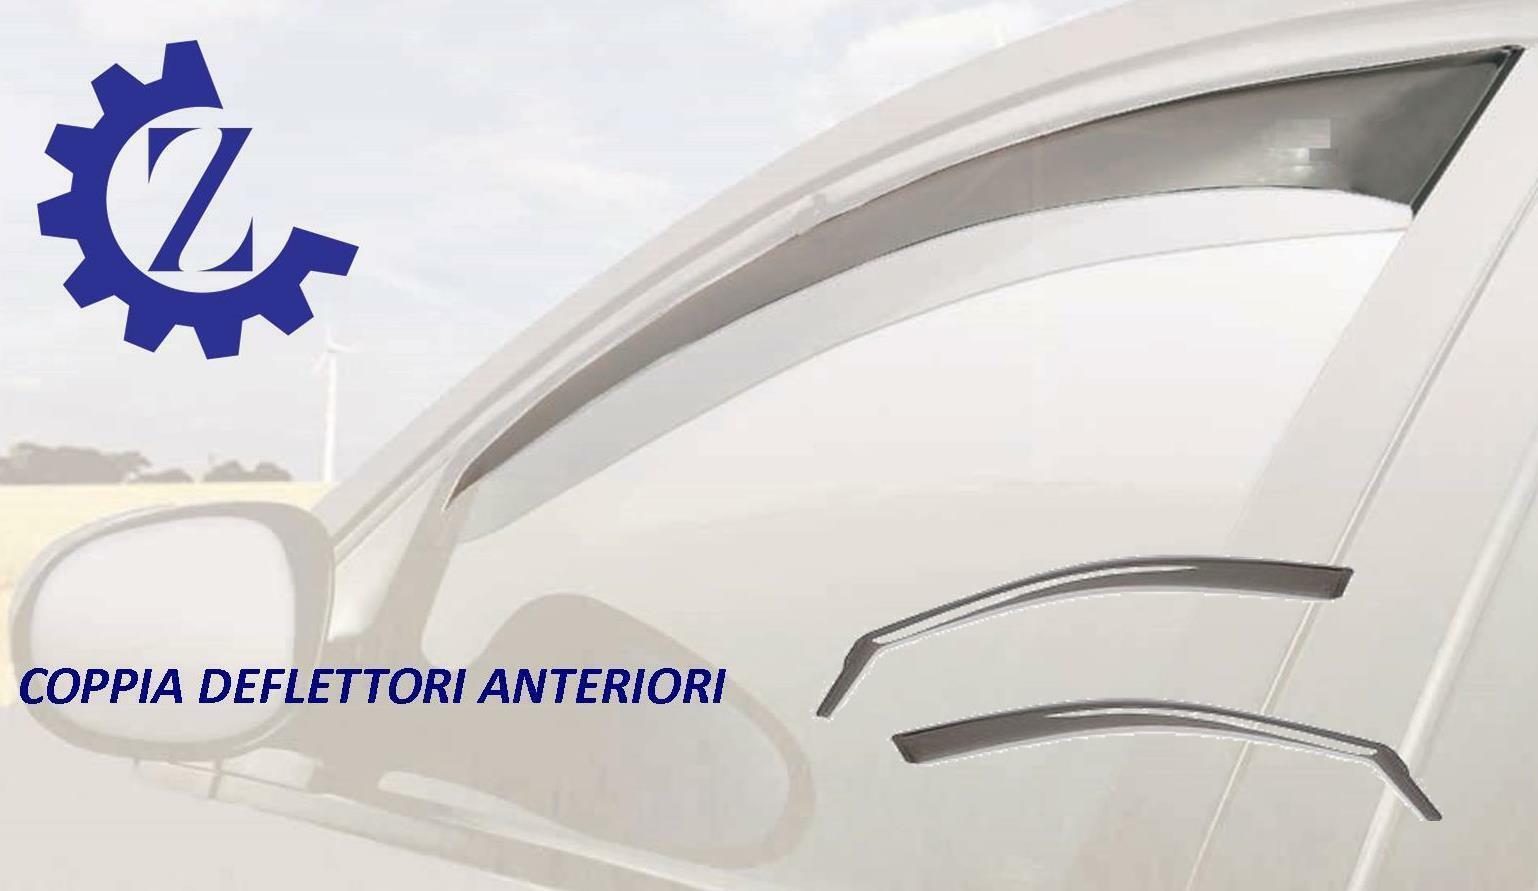 DEFLETTORI ARIA ANTITURBO PER SEAT IBIZA 02 08